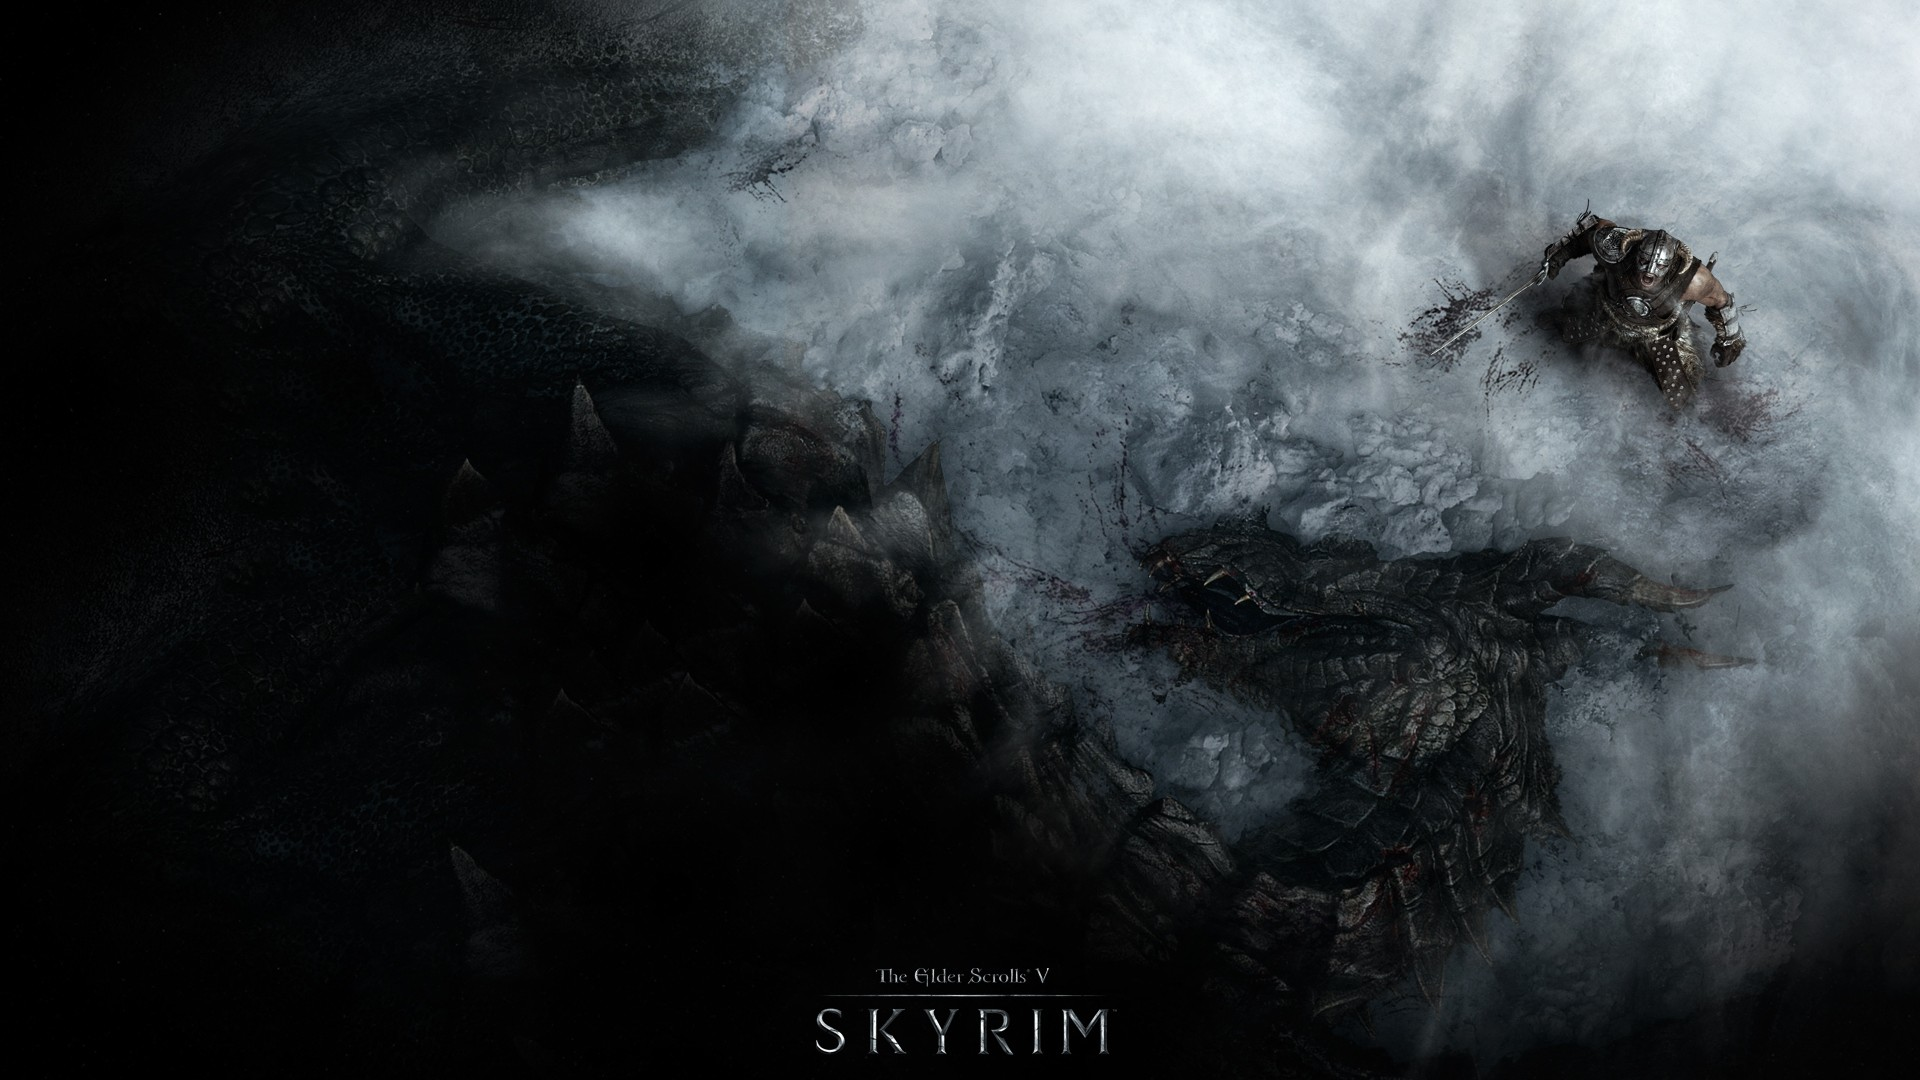 The Elder Scrolls V: Skyrim wallpaper top view